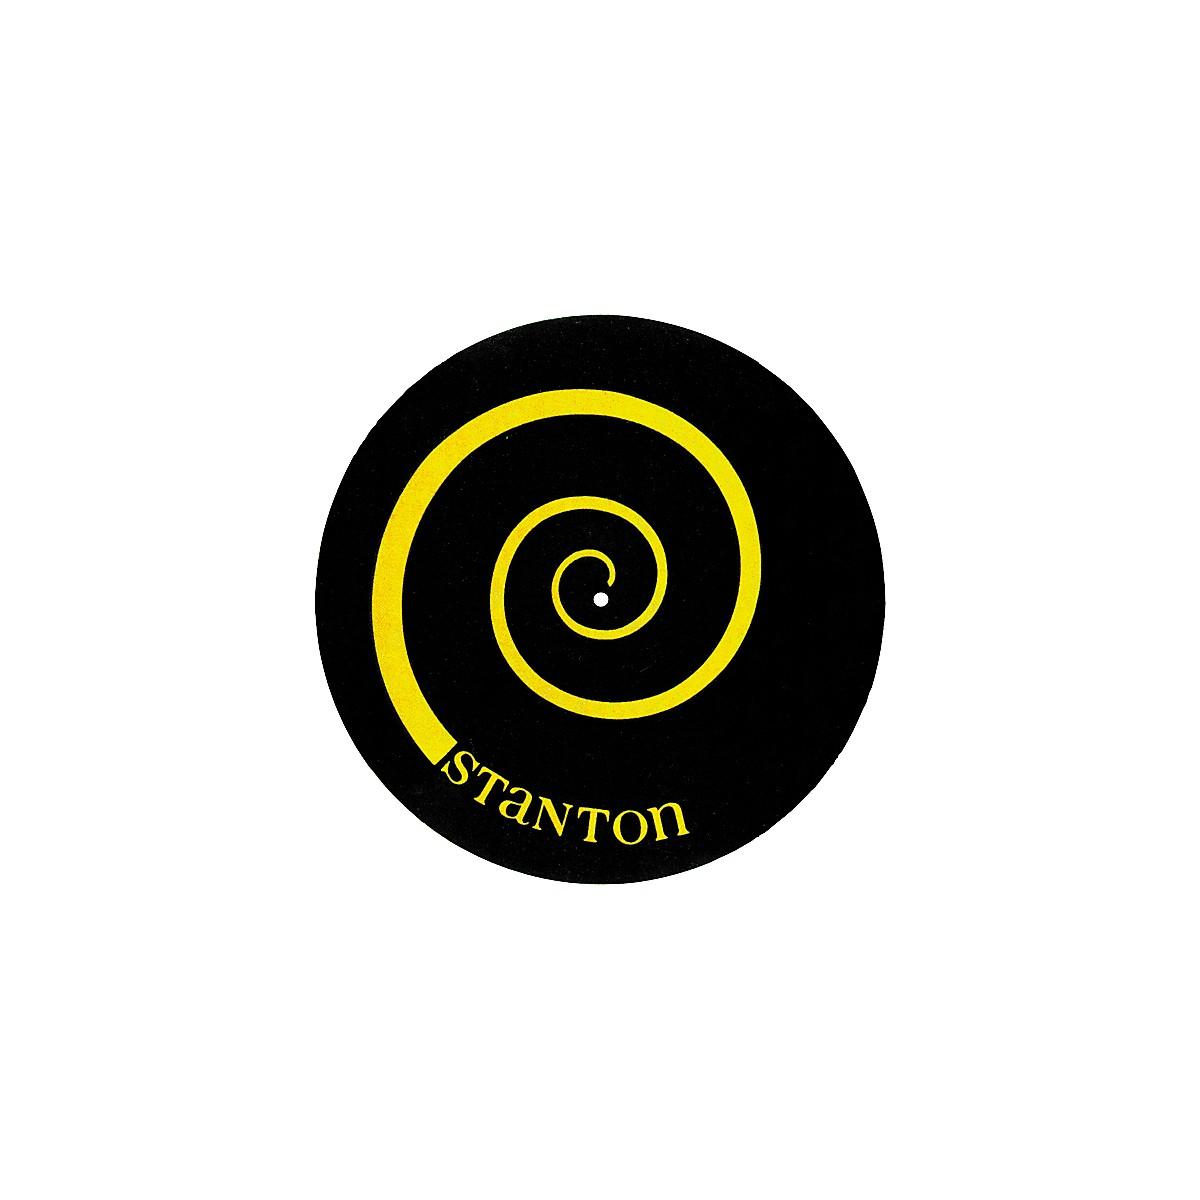 Stanton DSM-6 Yellow on Black Slipmats with Scratch Discs